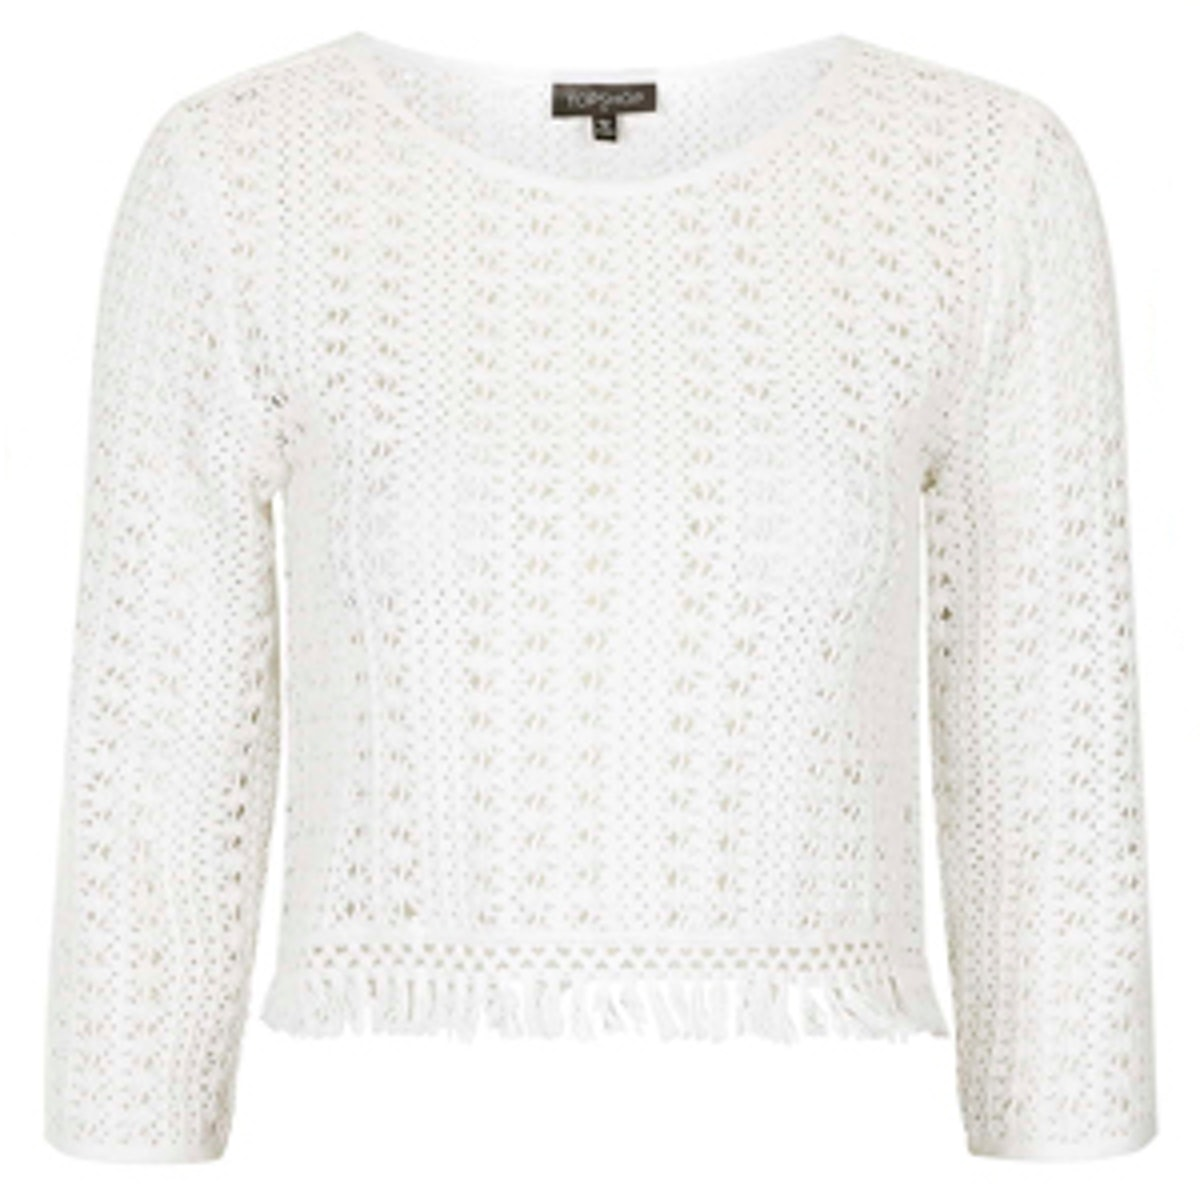 Fringe Trim Crochet Top